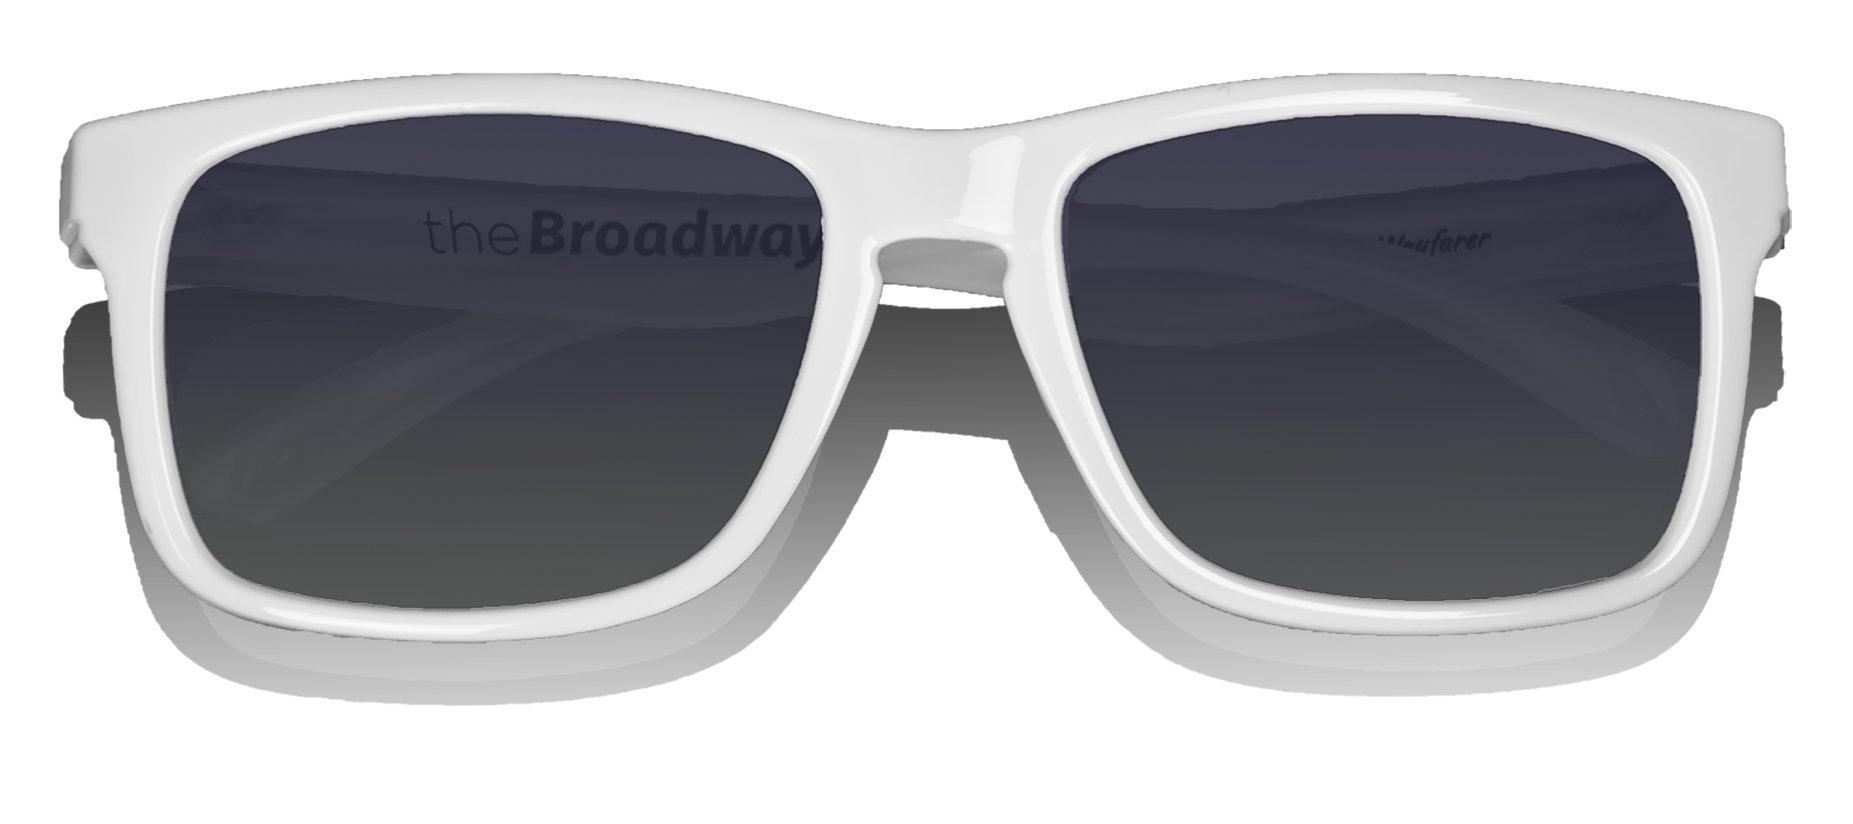 Floating Sunglasses - Polarized Floatable Wayfarer Shades by KZ Gear - 100% UV400 Lenses - KZ Shades that Float - Modern Floatable Style (Glossy White Frame - Gradient Black Lens)